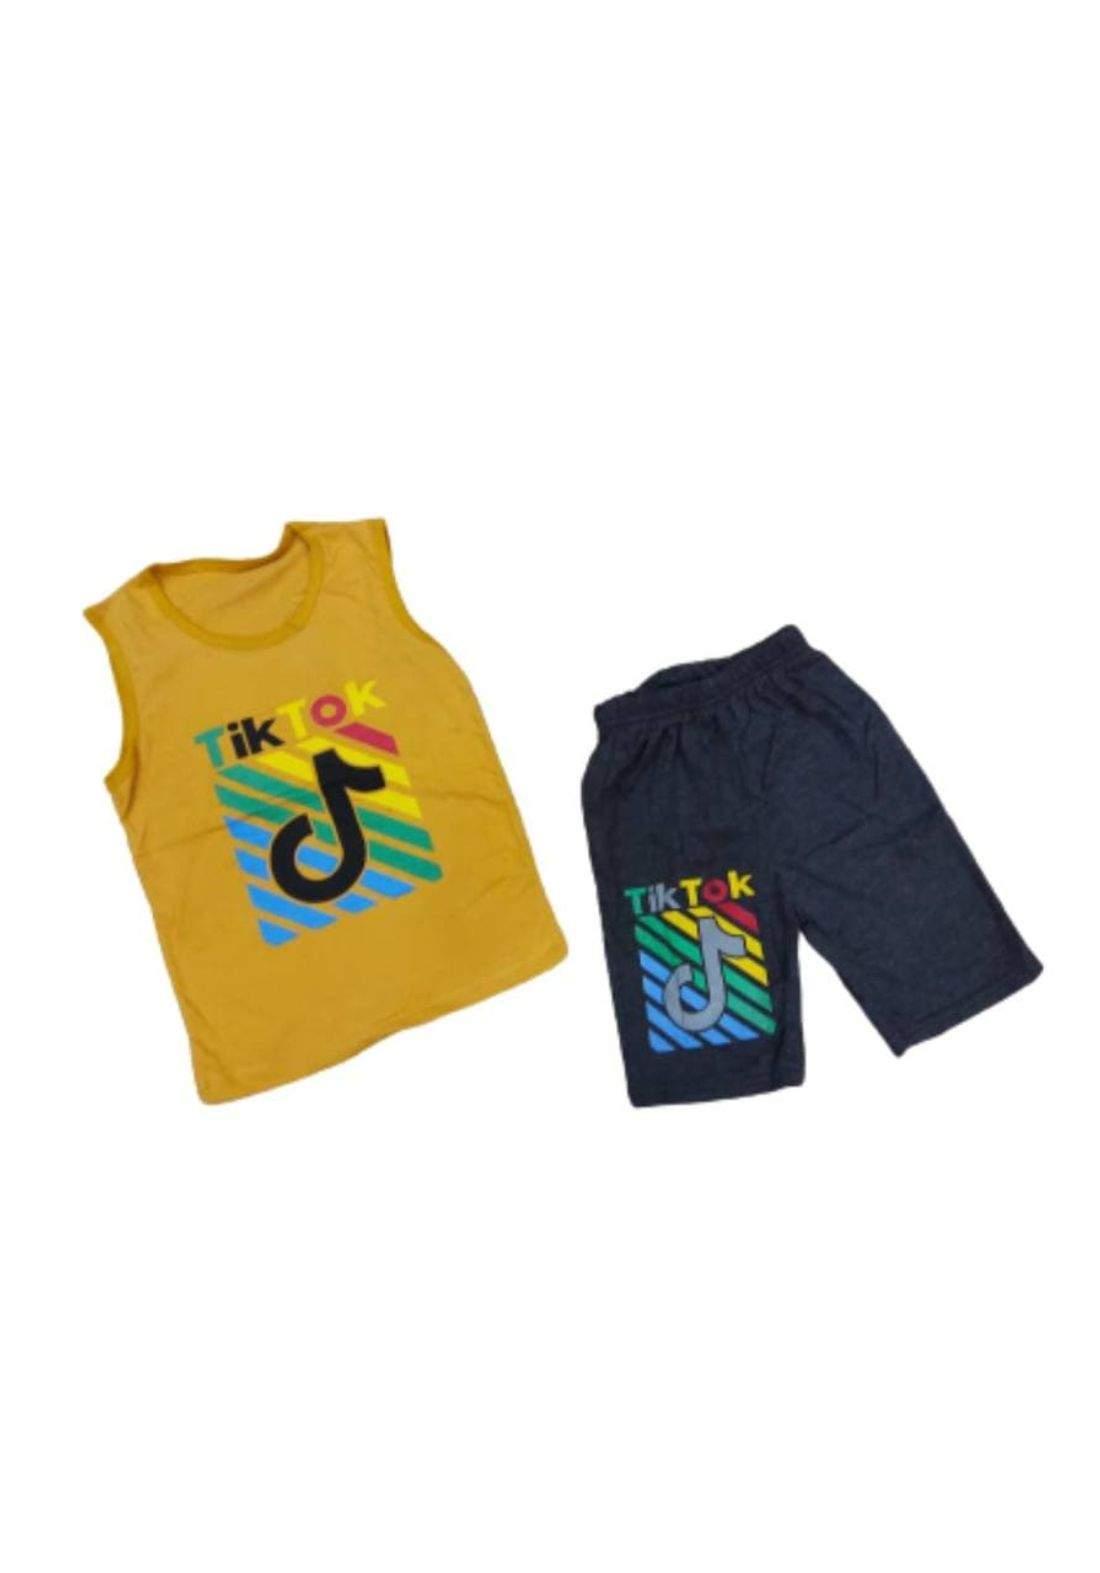 tracksuit for boys yellow (shirt +short) ( تراكسوت ولادي اصفر (برموده وكيمونه